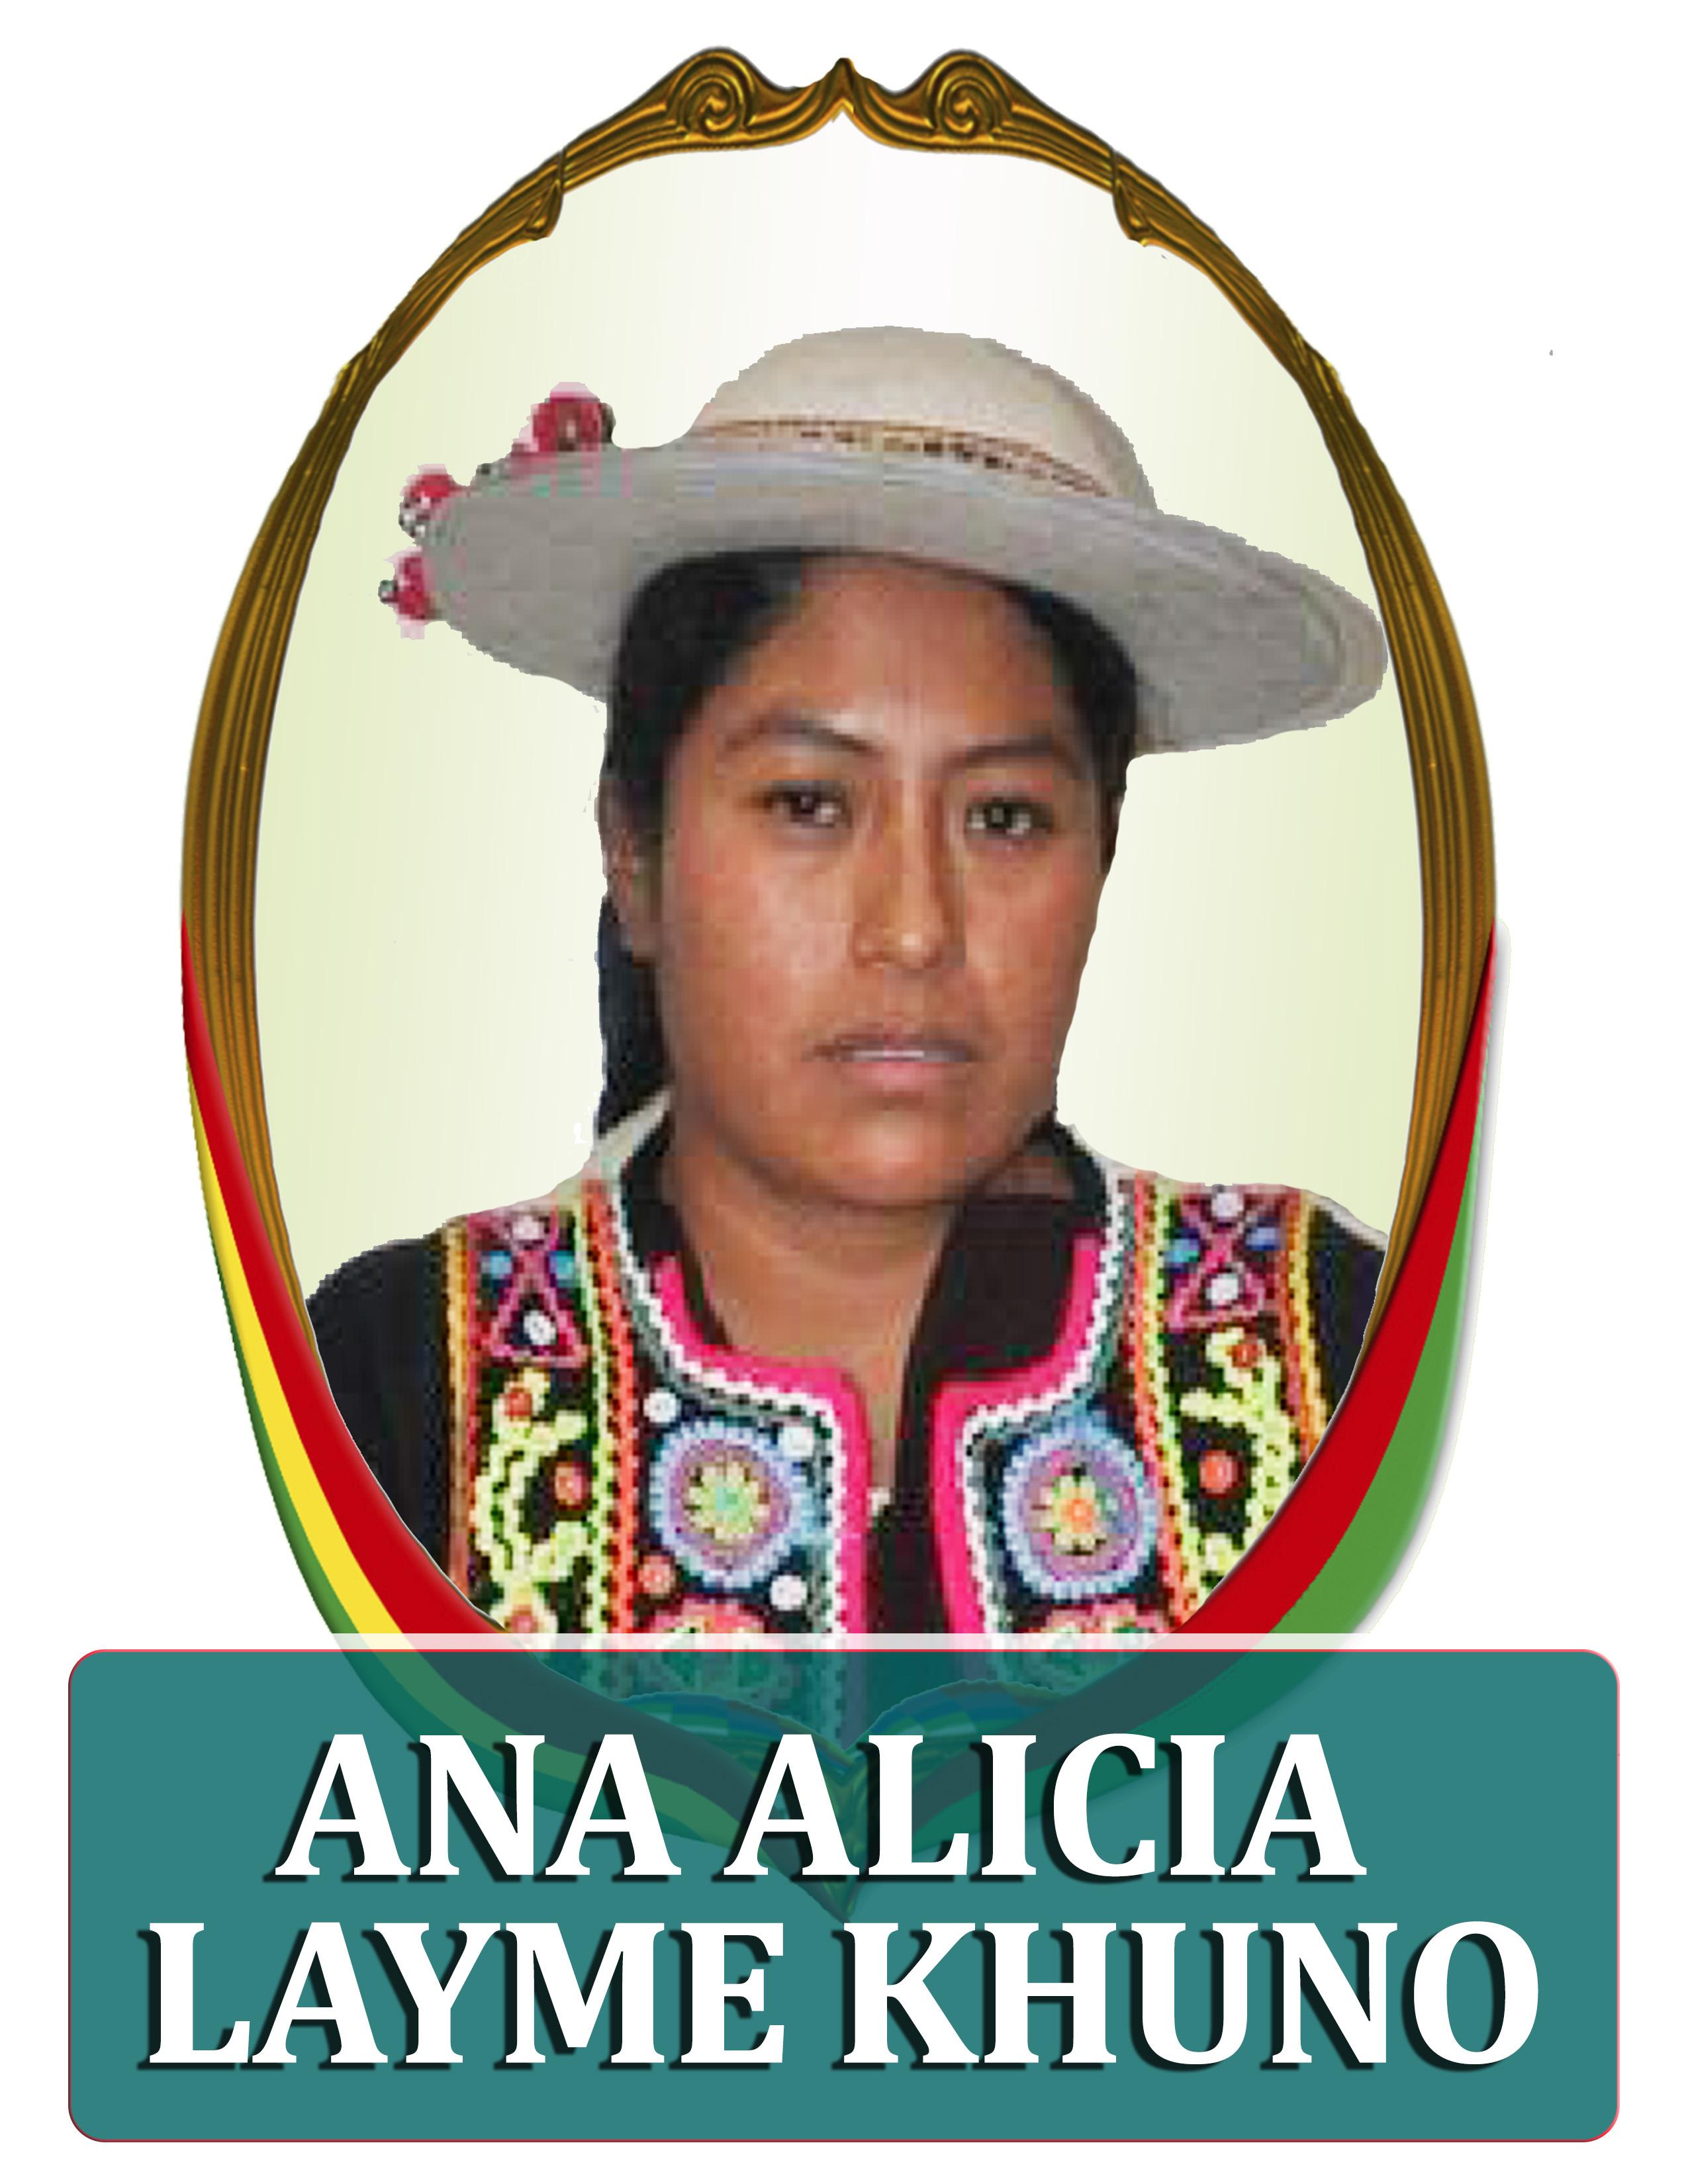 ANA ALICIA LAYME KUNO